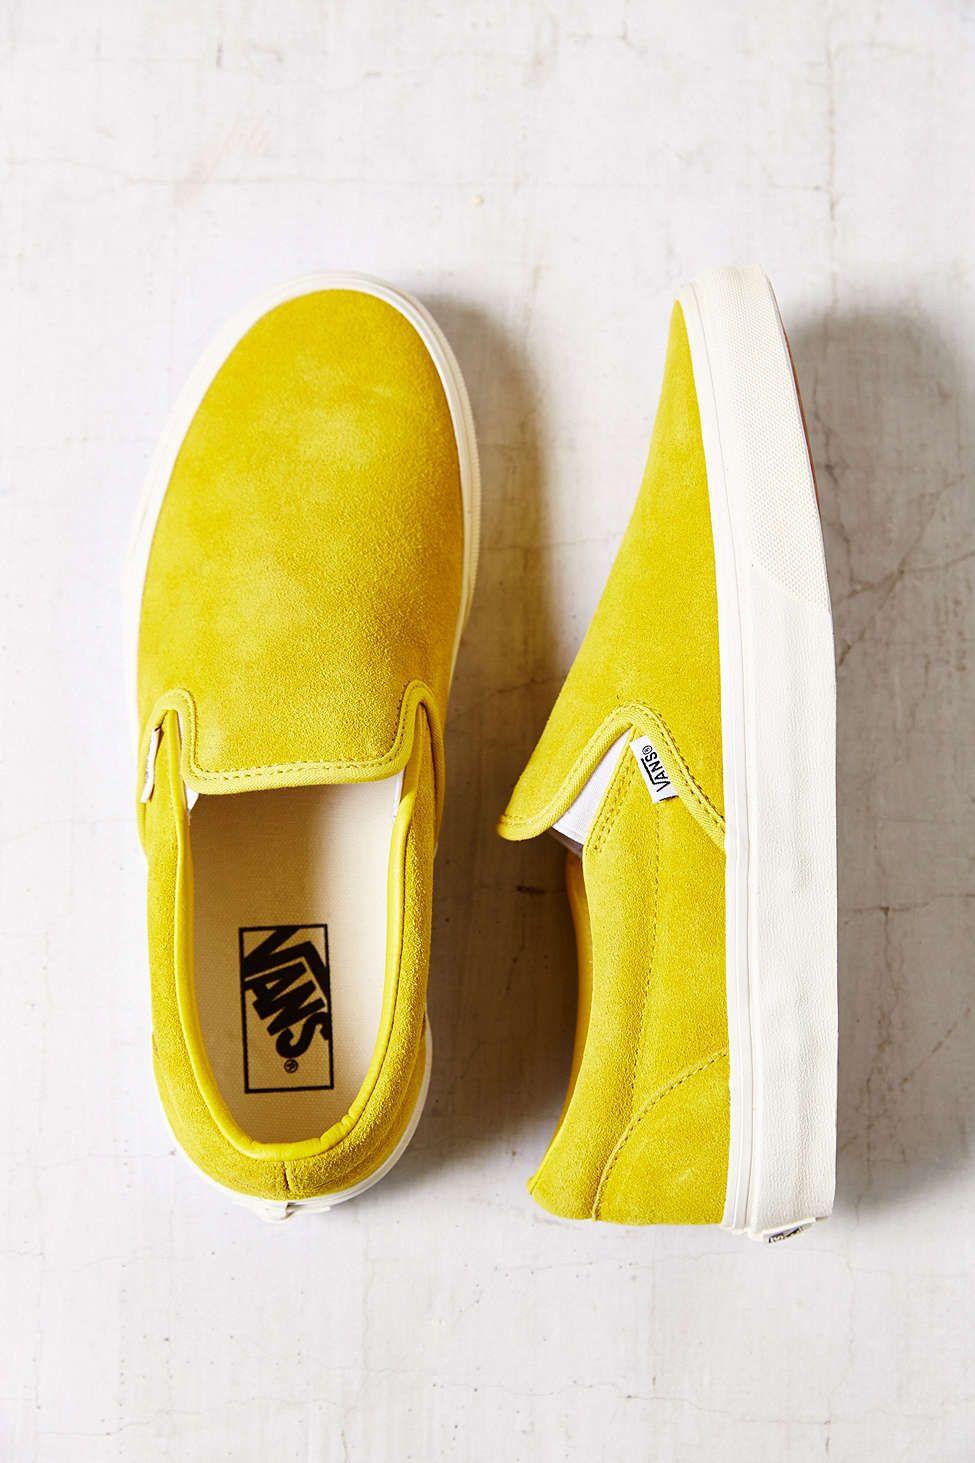 dd6499179411 Vans Vintage Suede Classic Women s Slip-On Sneaker  UrbanOutfitters explore  Pinterest